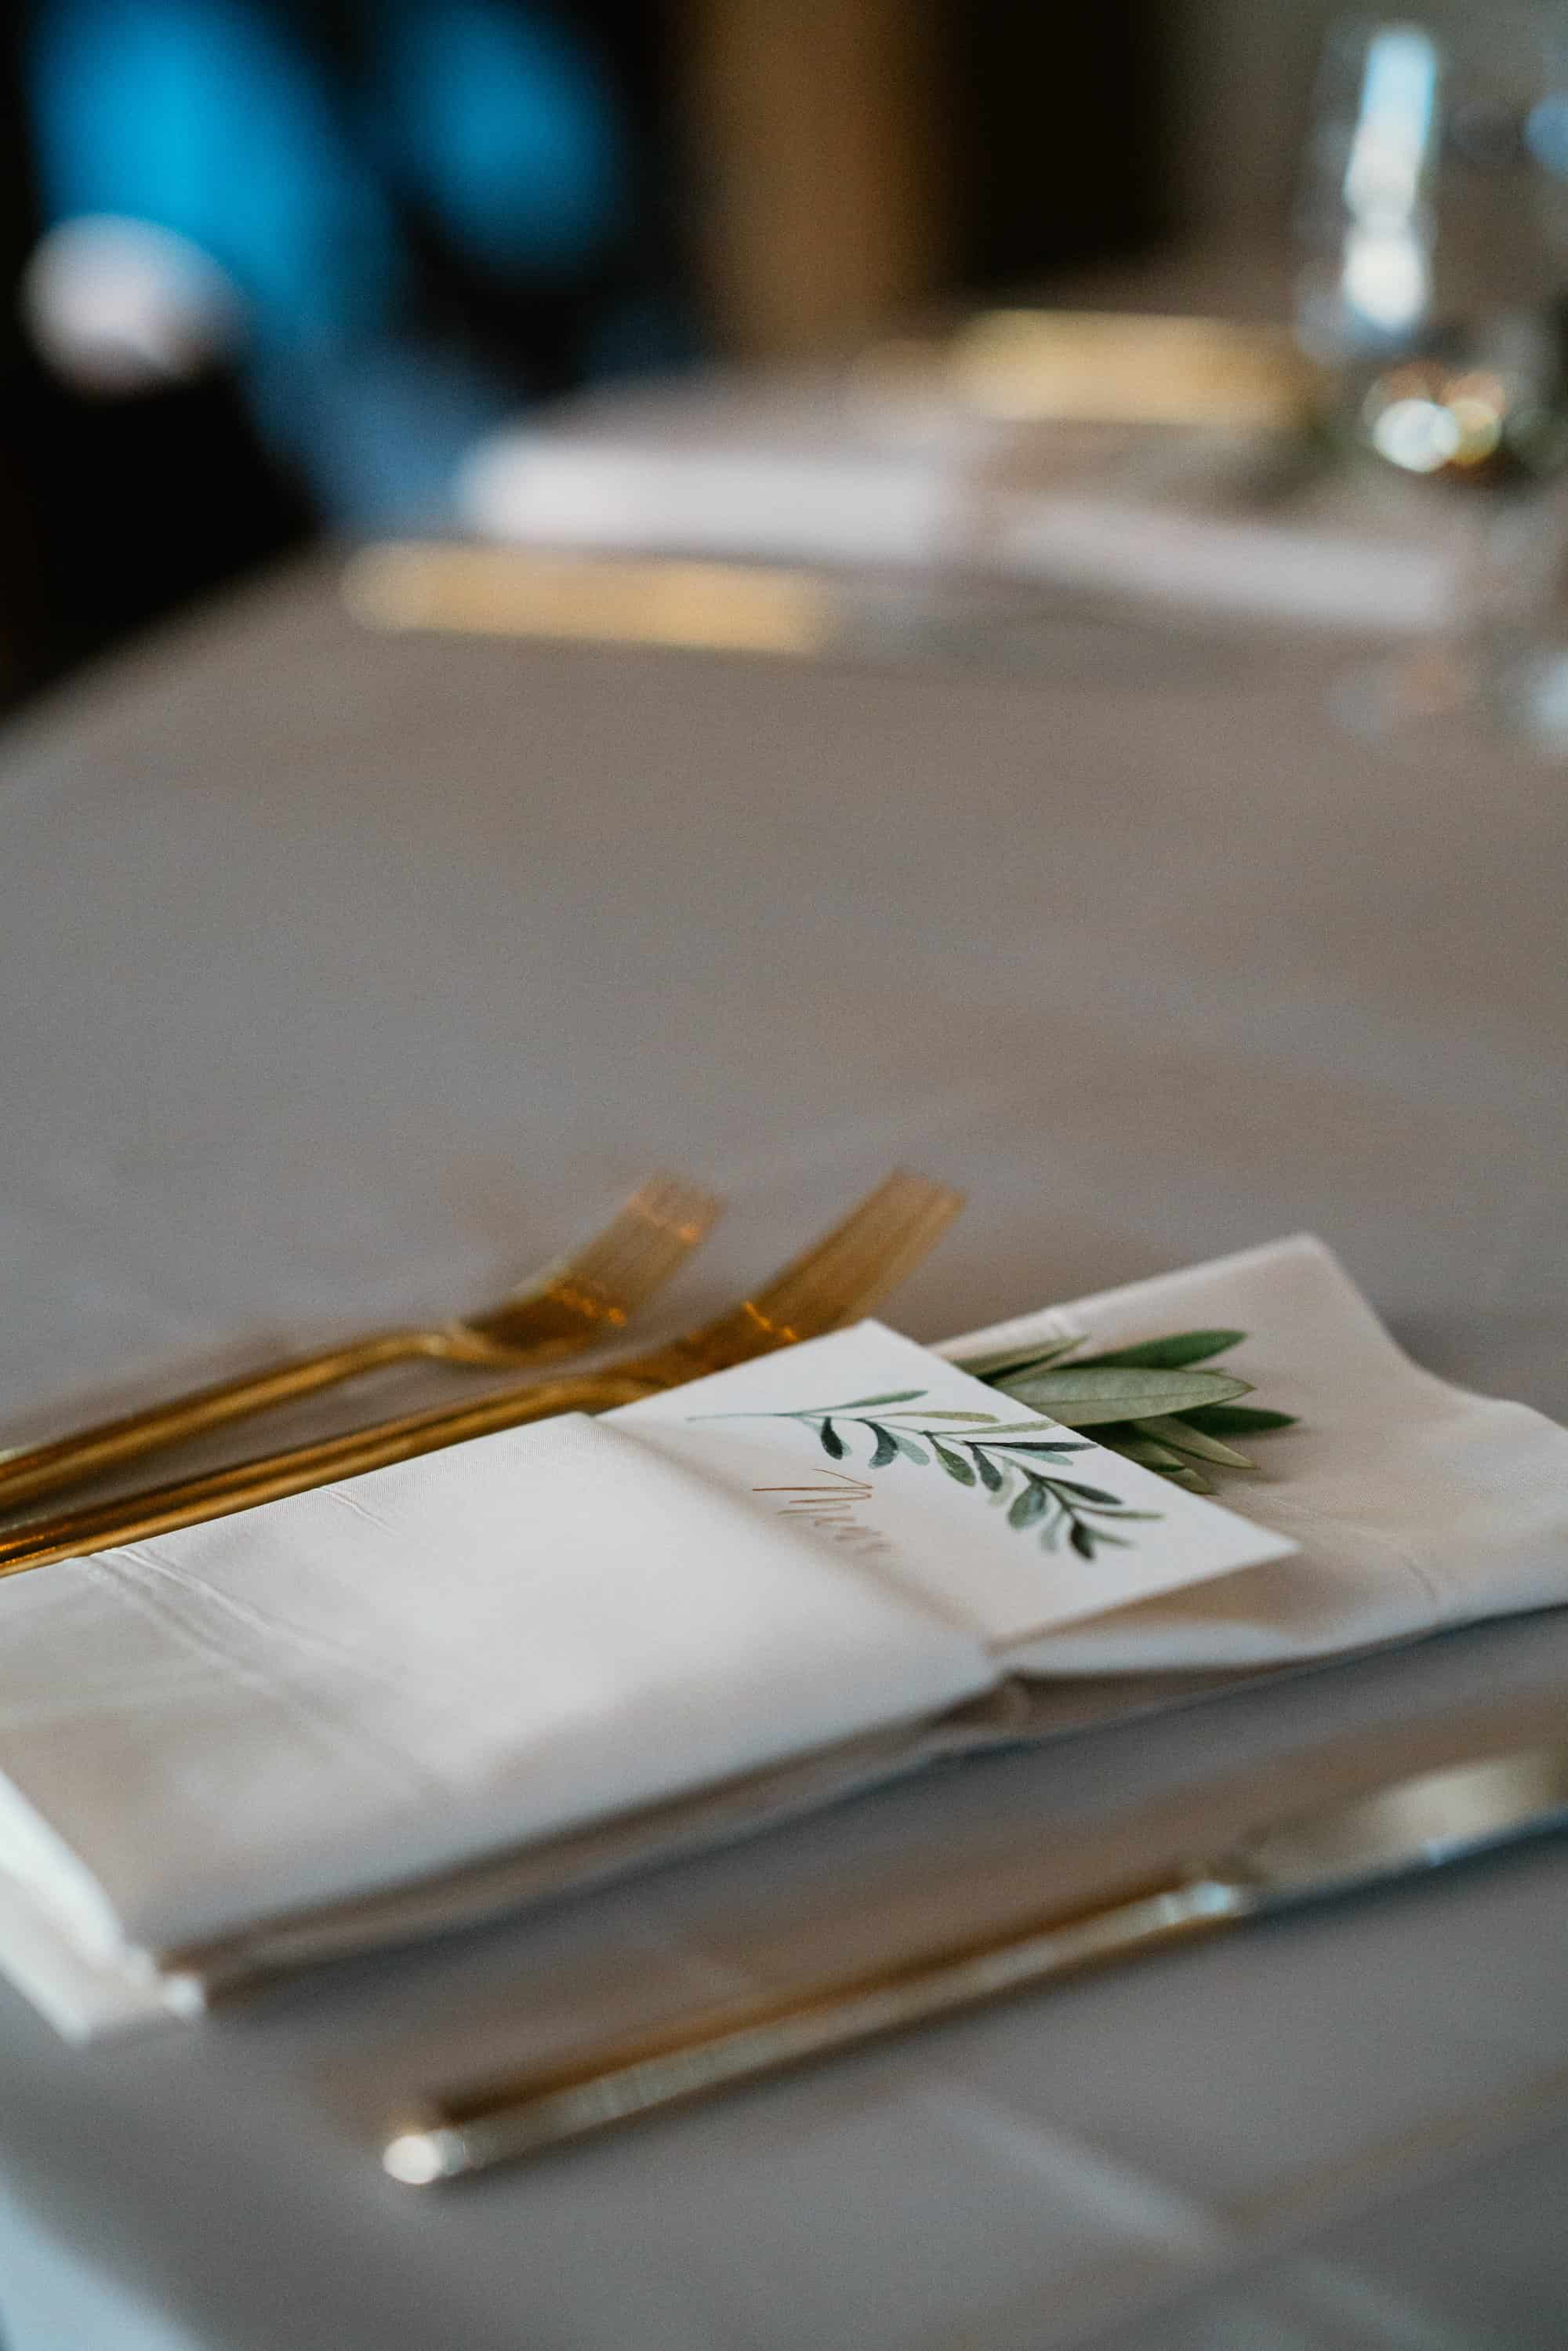 higuera ranch wedding details